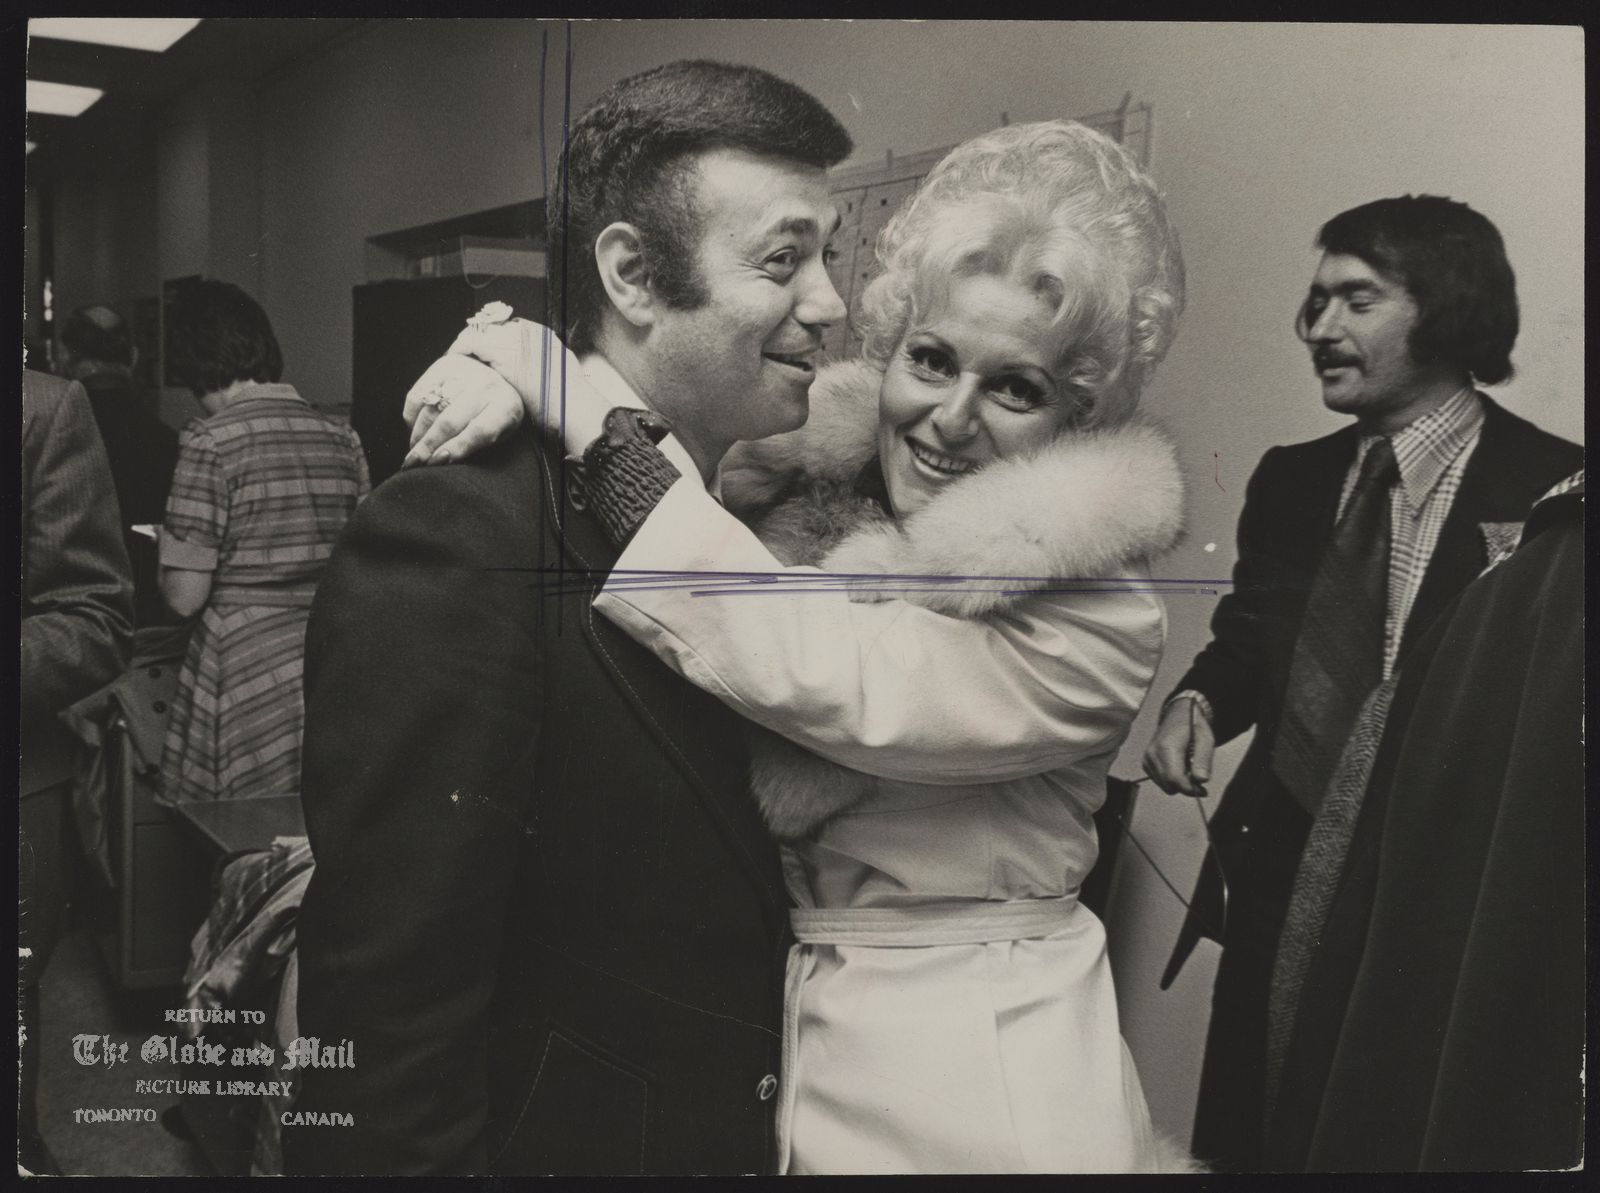 Mel LASTMAN North York. Politician (Mel Lastman, the new mayor of North York, receives a victory hug from his wife, Marilyn.)